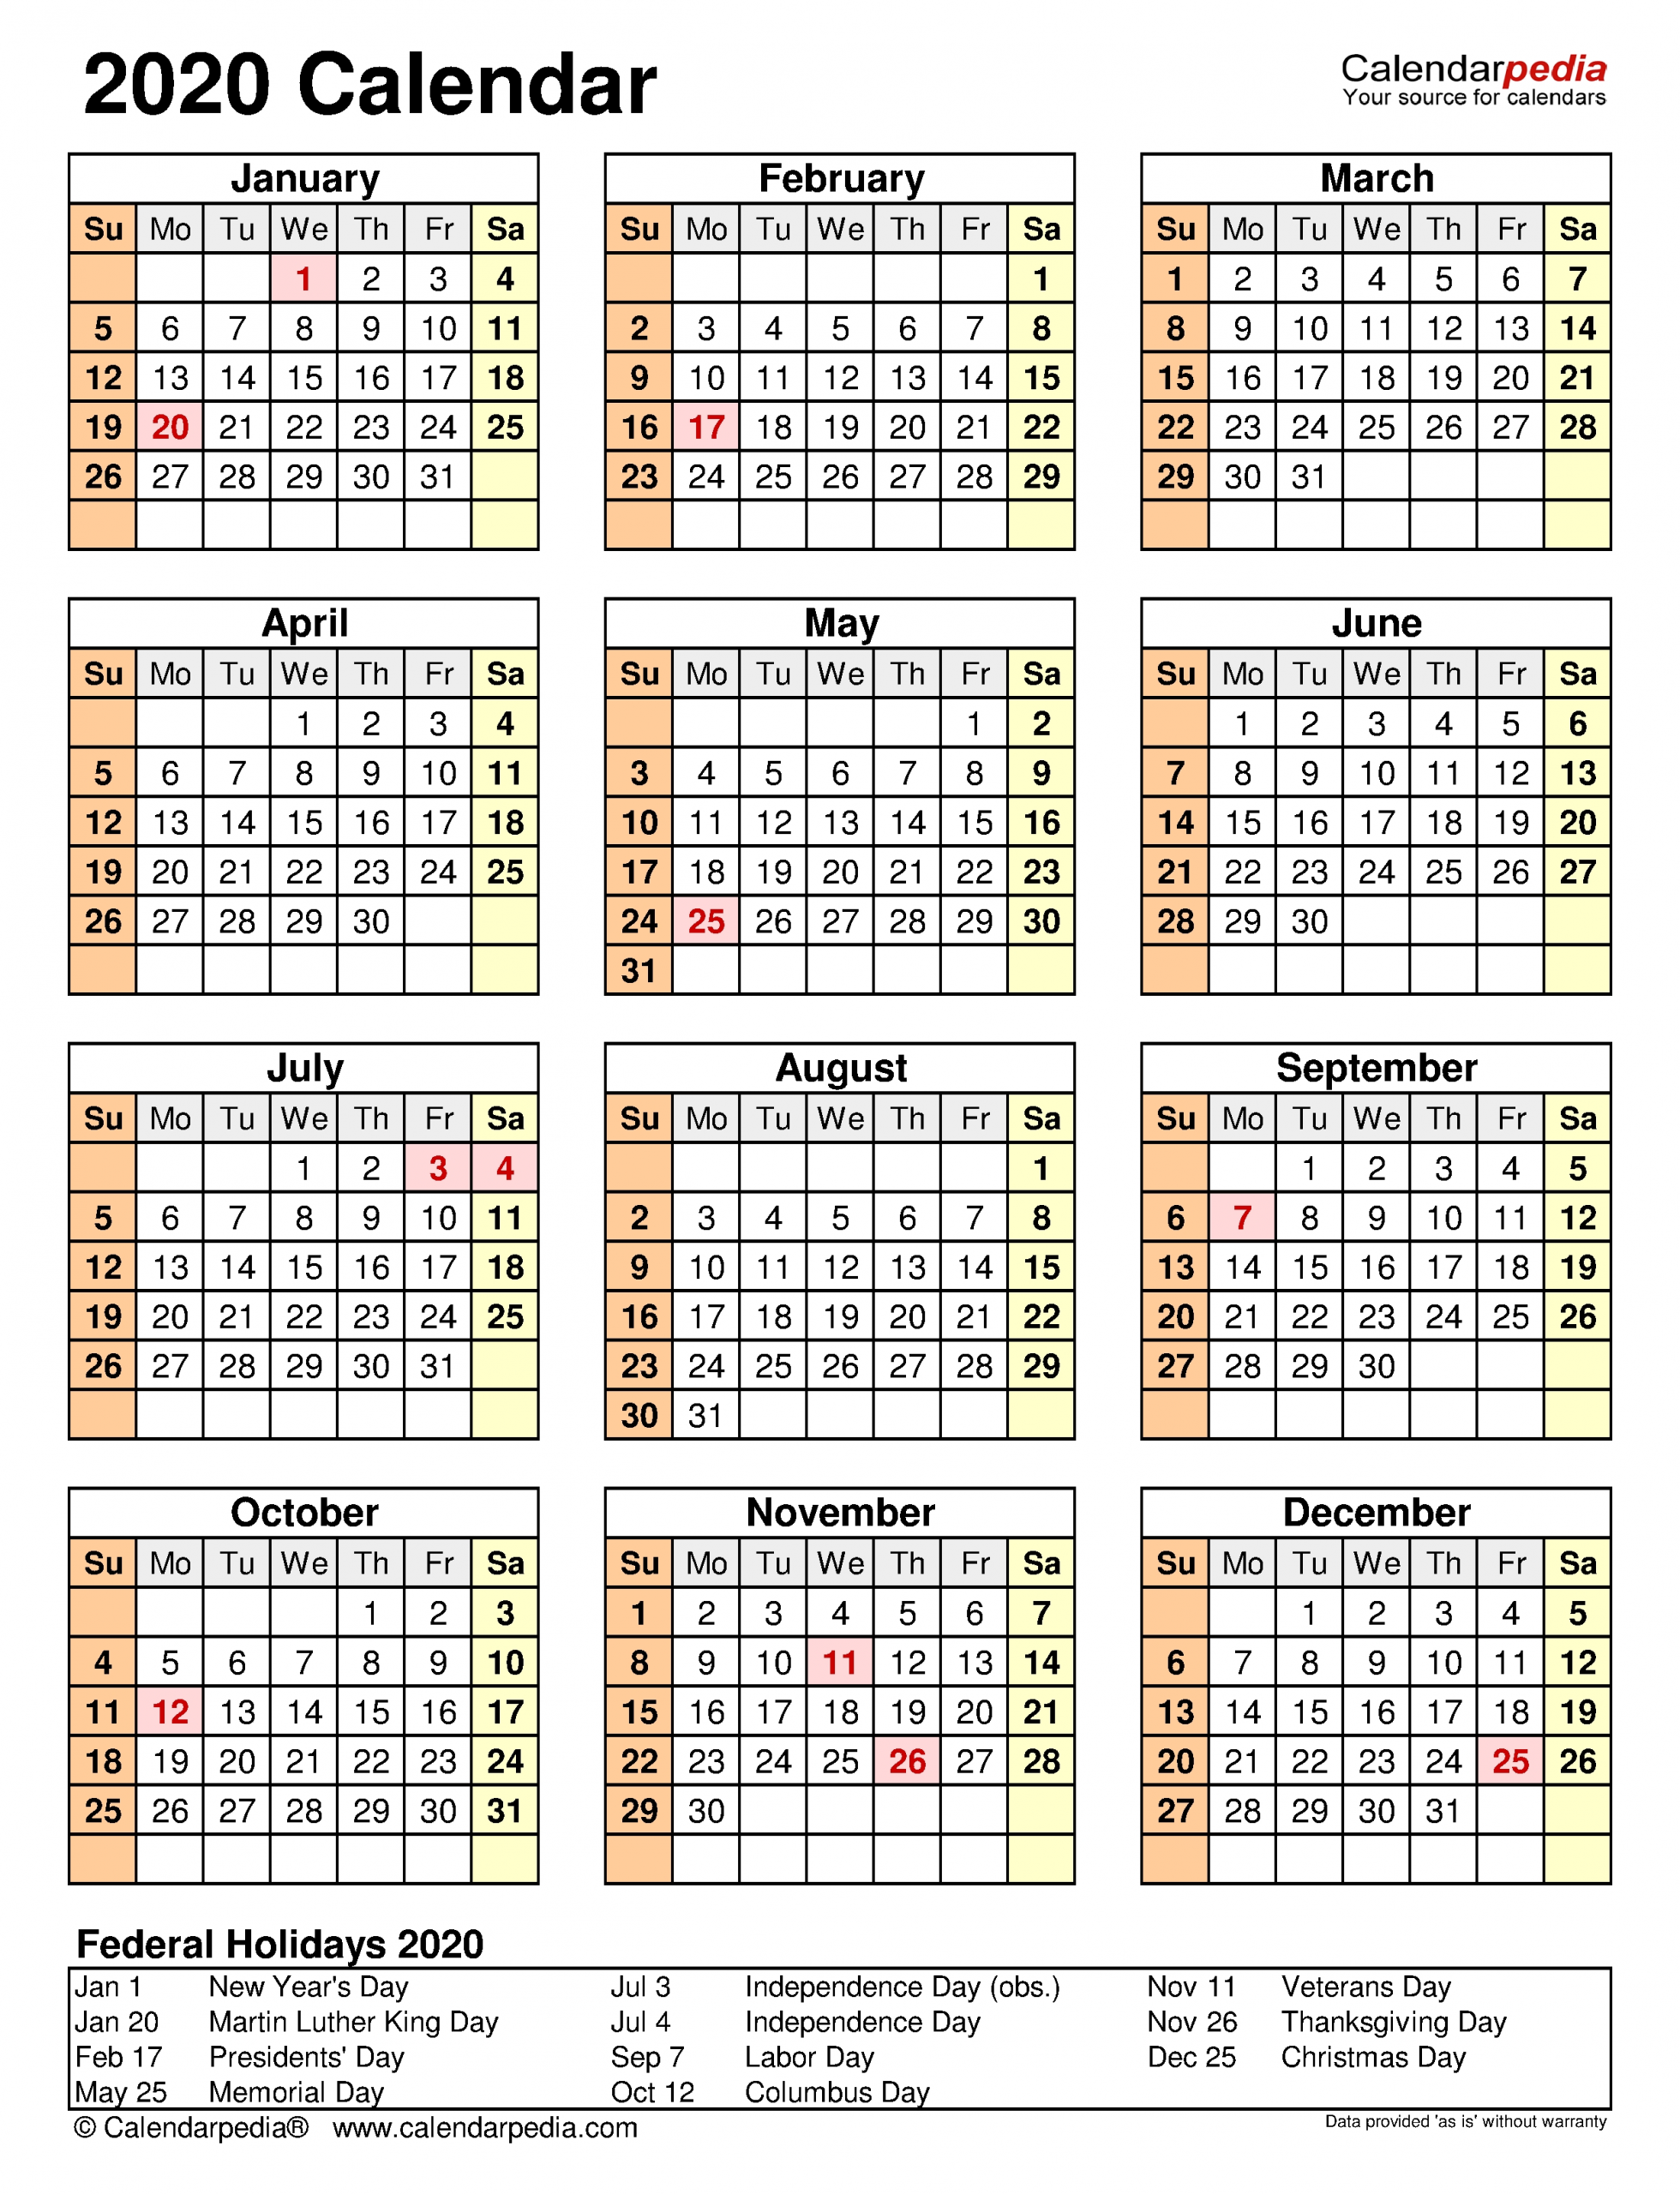 2020 Calendar - Free Printable Word Templates - Calendarpedia  2021 Attendance Calendar